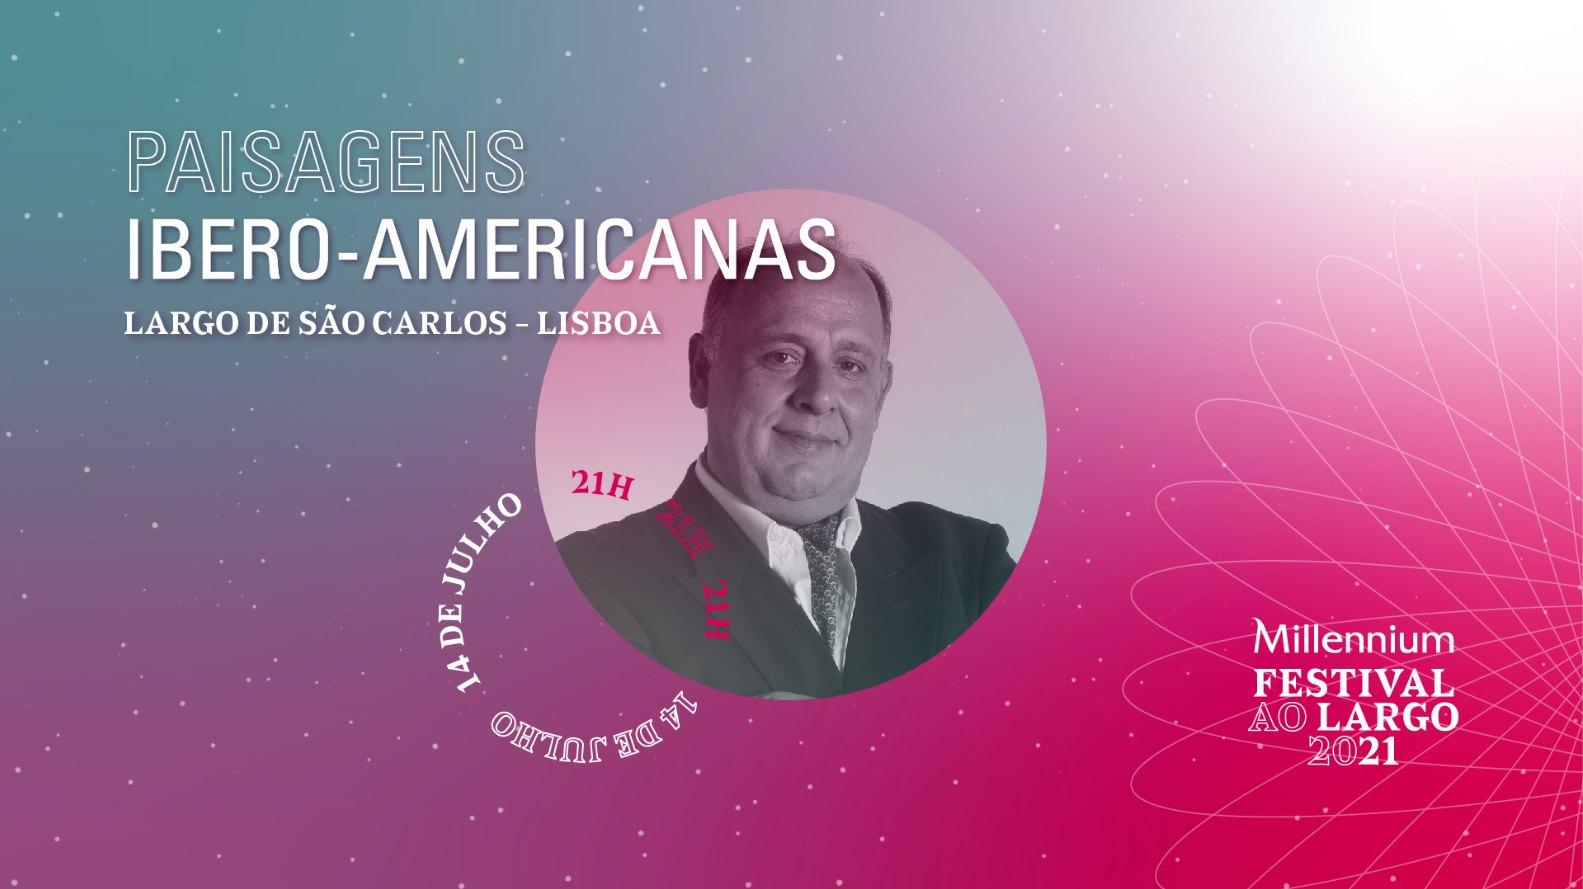 Paisagens ibero-americanas